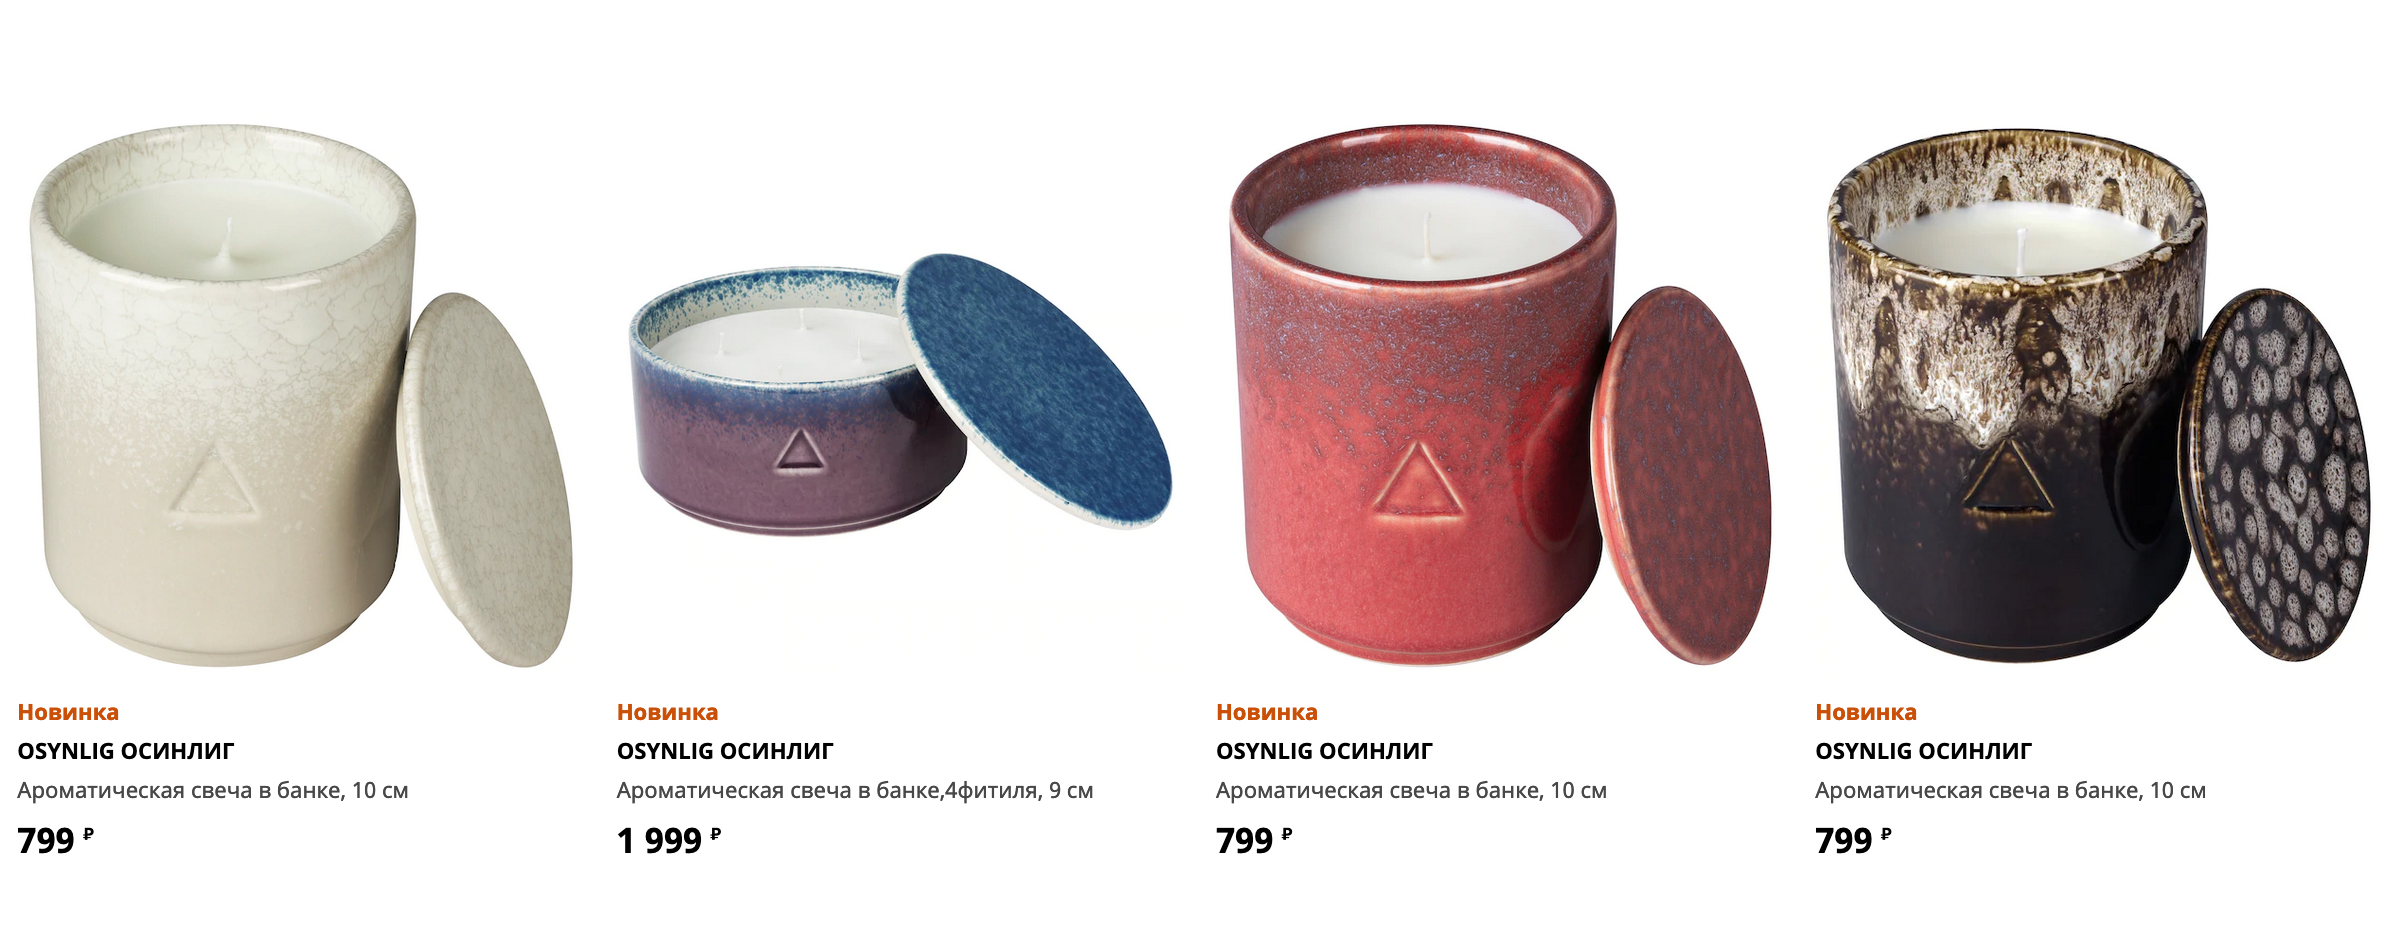 Ароматические свечи ОСИНЛИГ, скриншот с сайта IKEA.ru